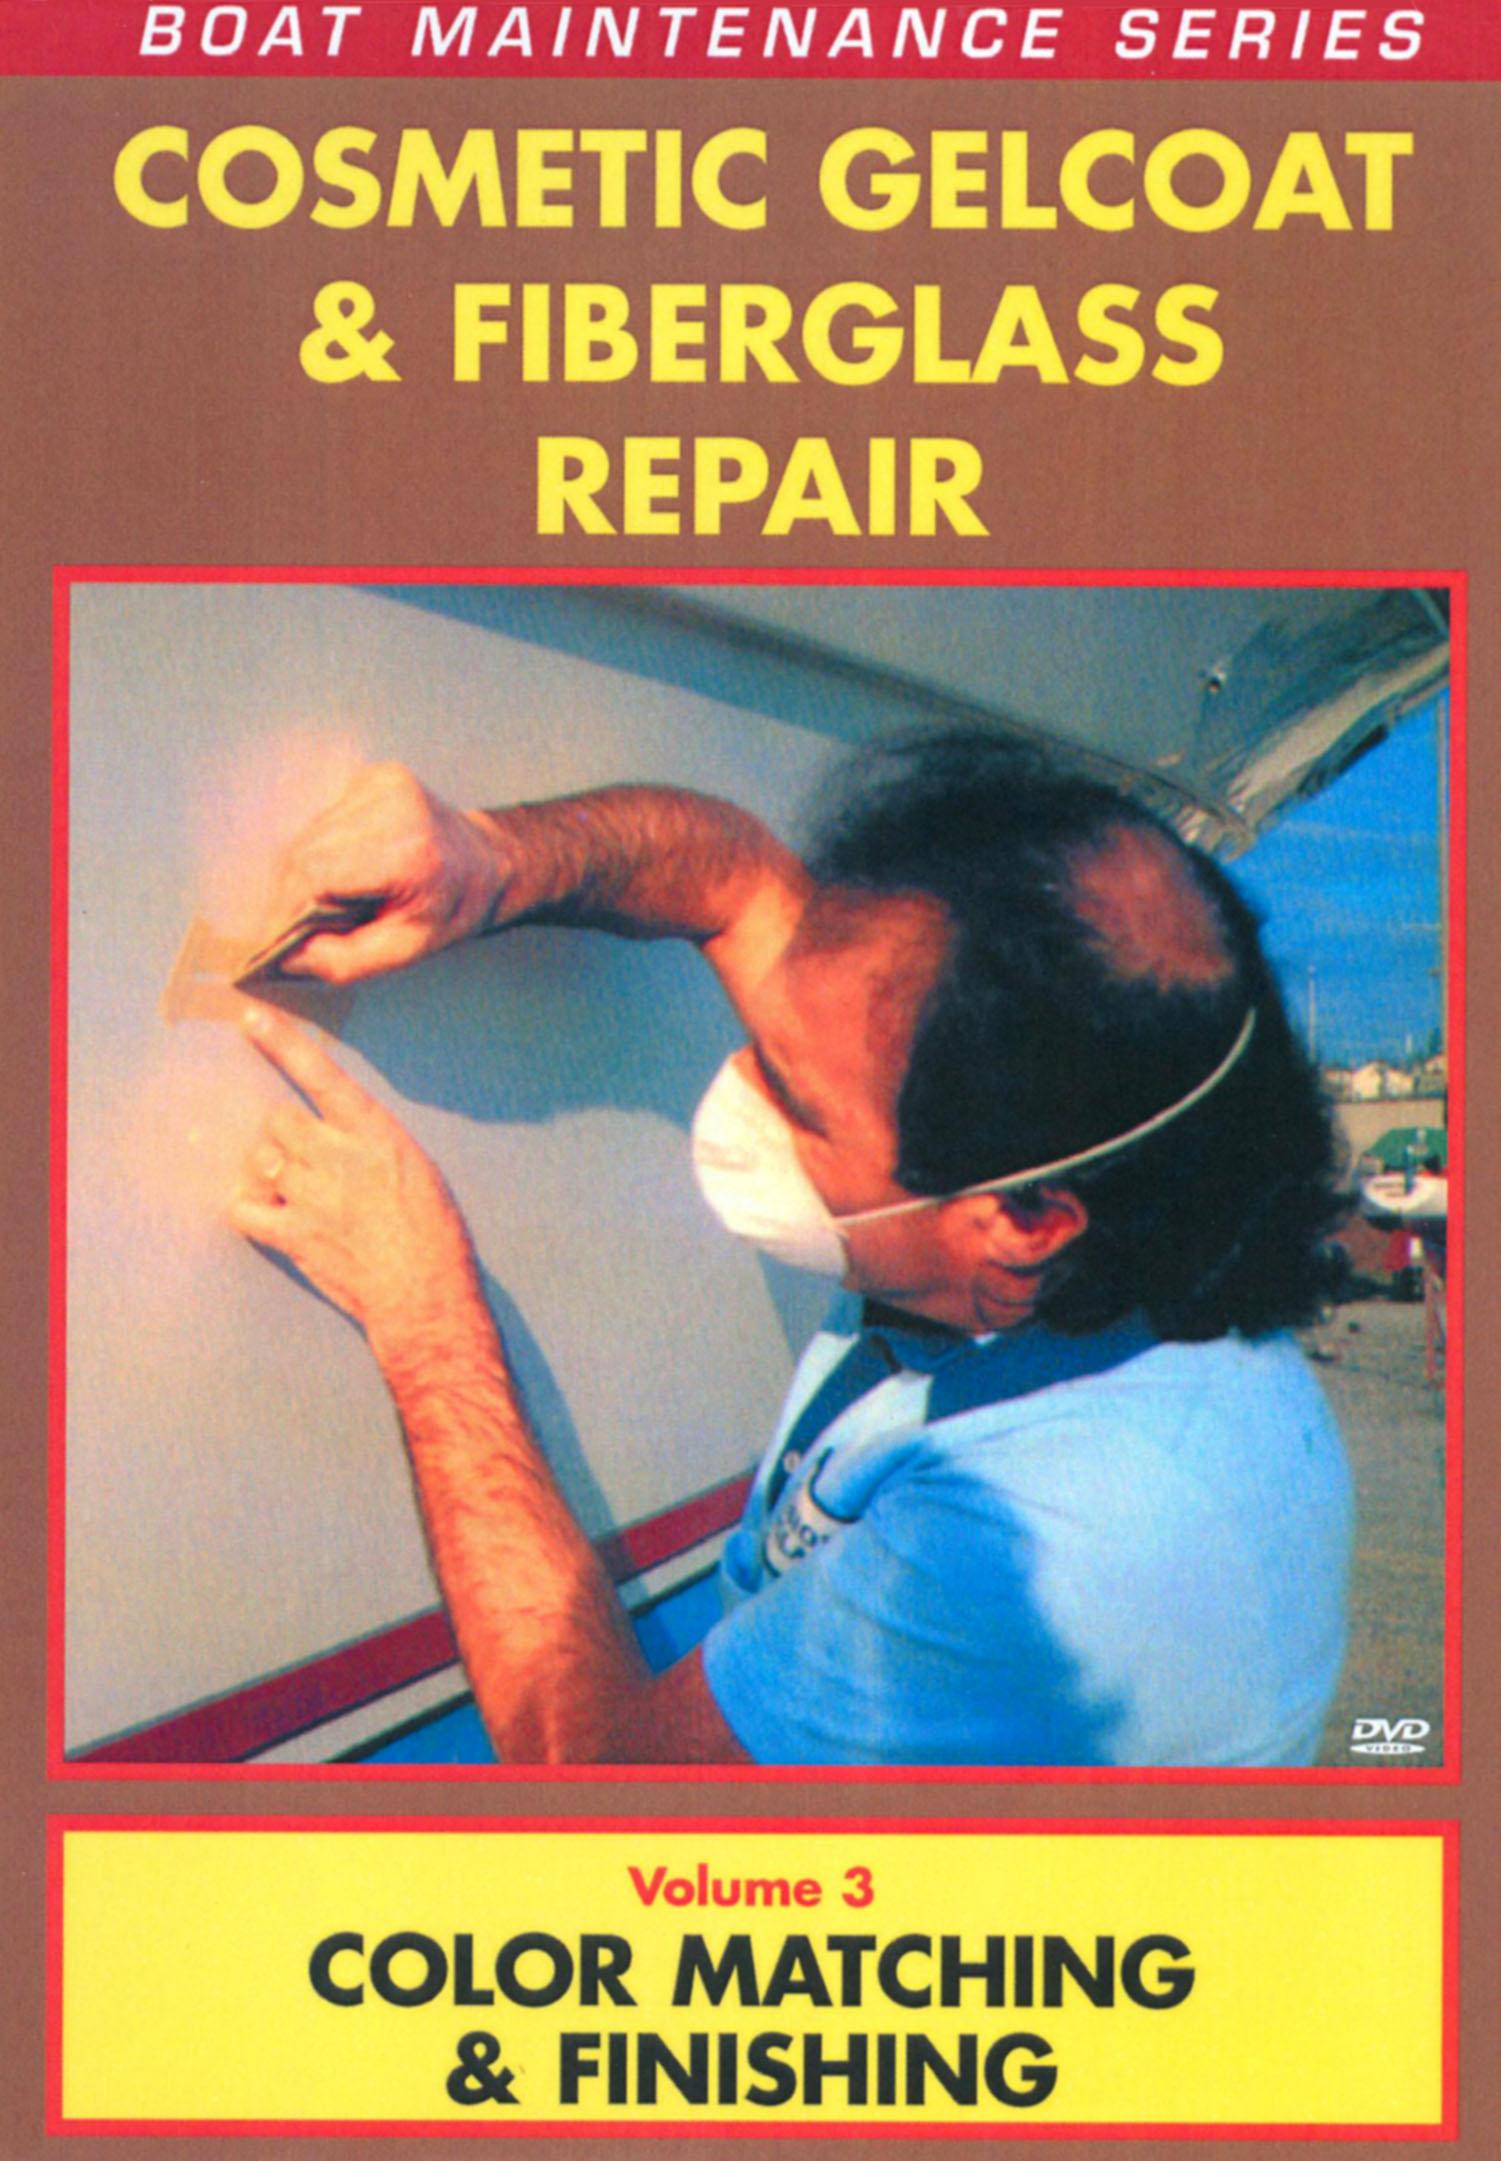 Cosmetic Gelcoat and Fiberglass Repair, Vol. 3: Color Matching & Finishing